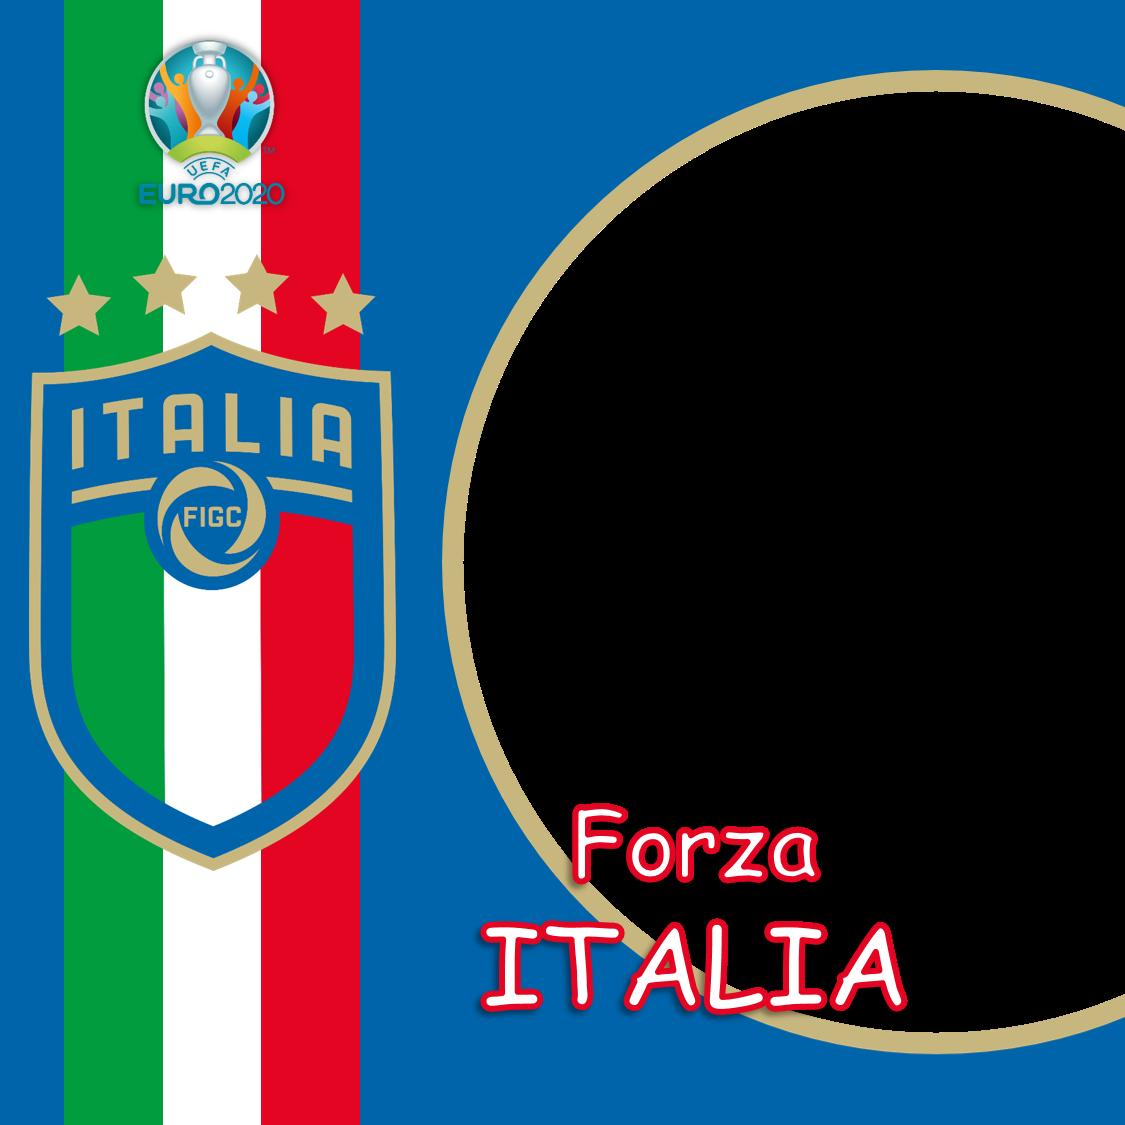 Template Desain Bingkai Foto Twibbon Italia Euro 2020 - Italy Euro 2021